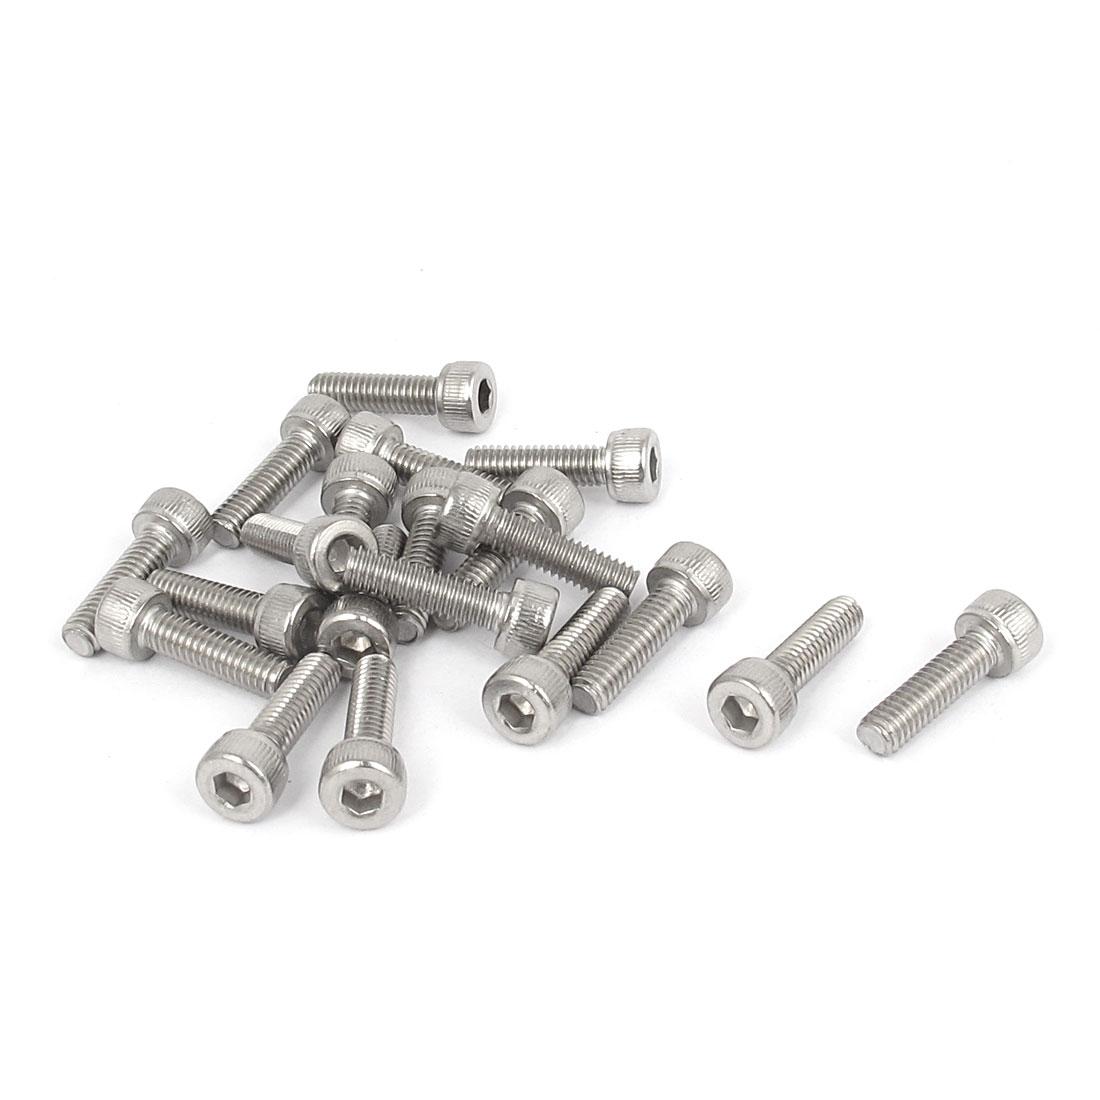 M4x14mm Thread 304 Stainless Steel Hex Key Bolt Socket Head Cap Screws 20pcs